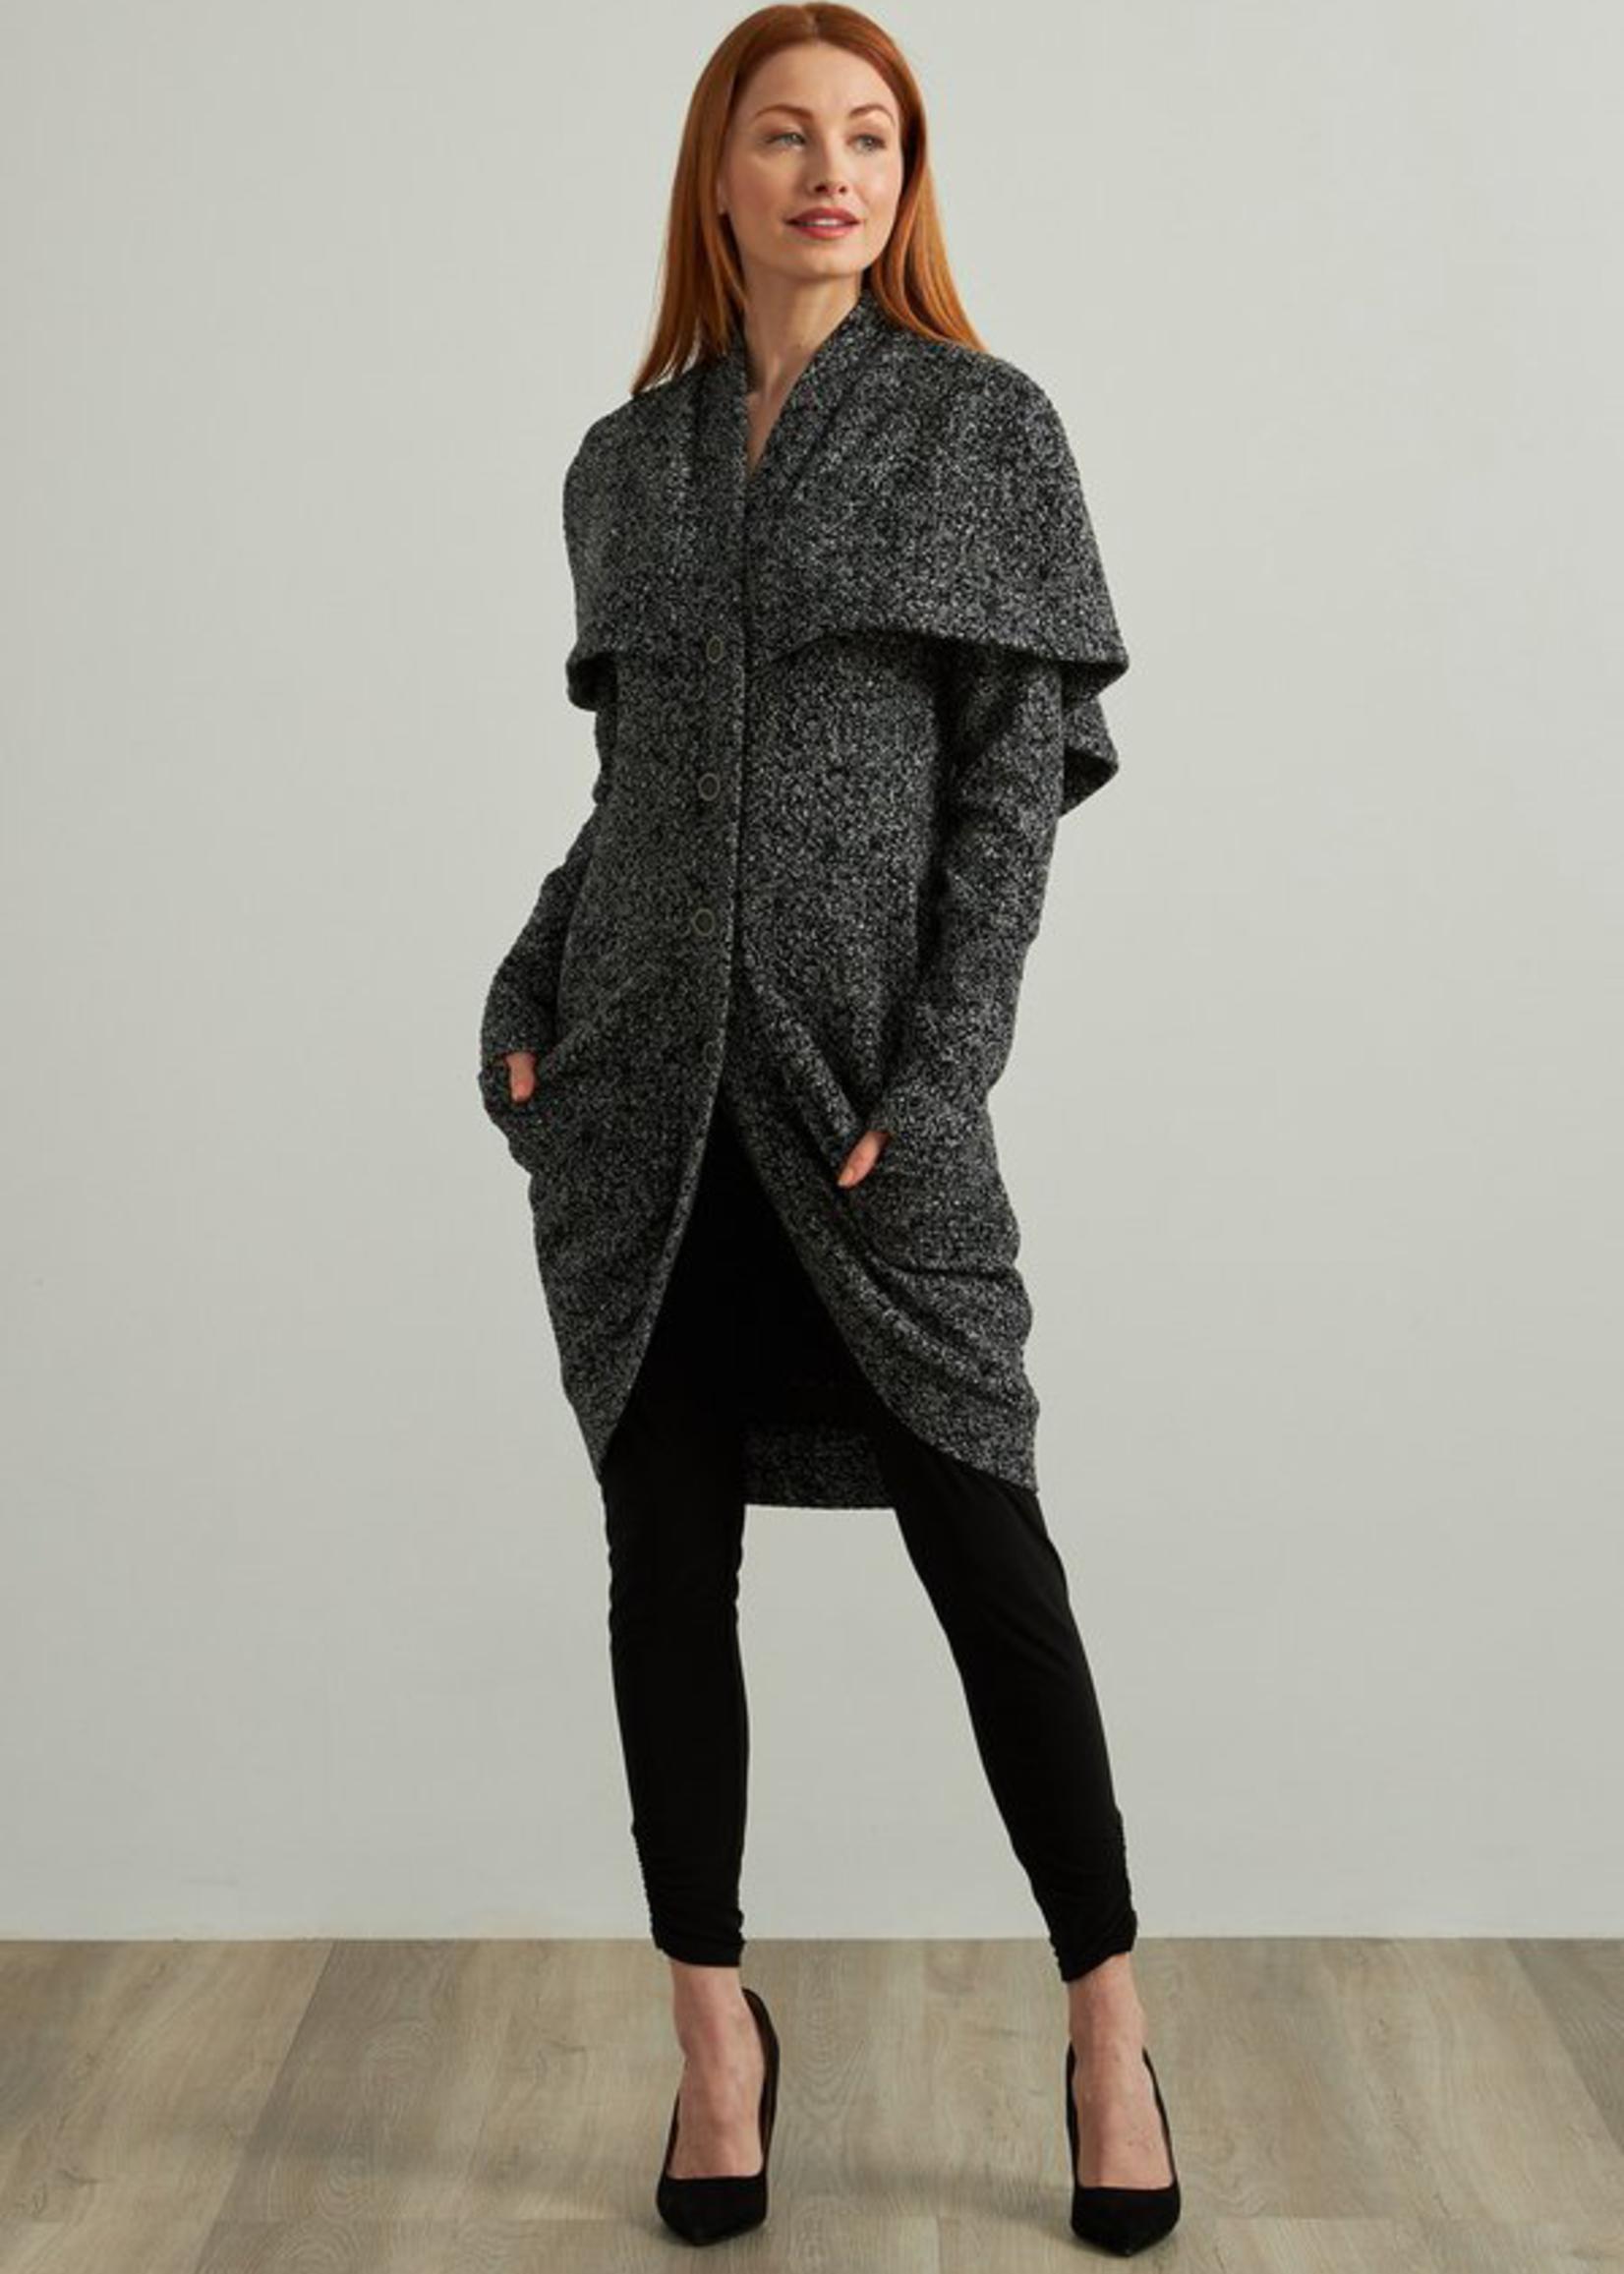 Joseph Ribkoff Joseph Ribkoff Knit Jacket Style